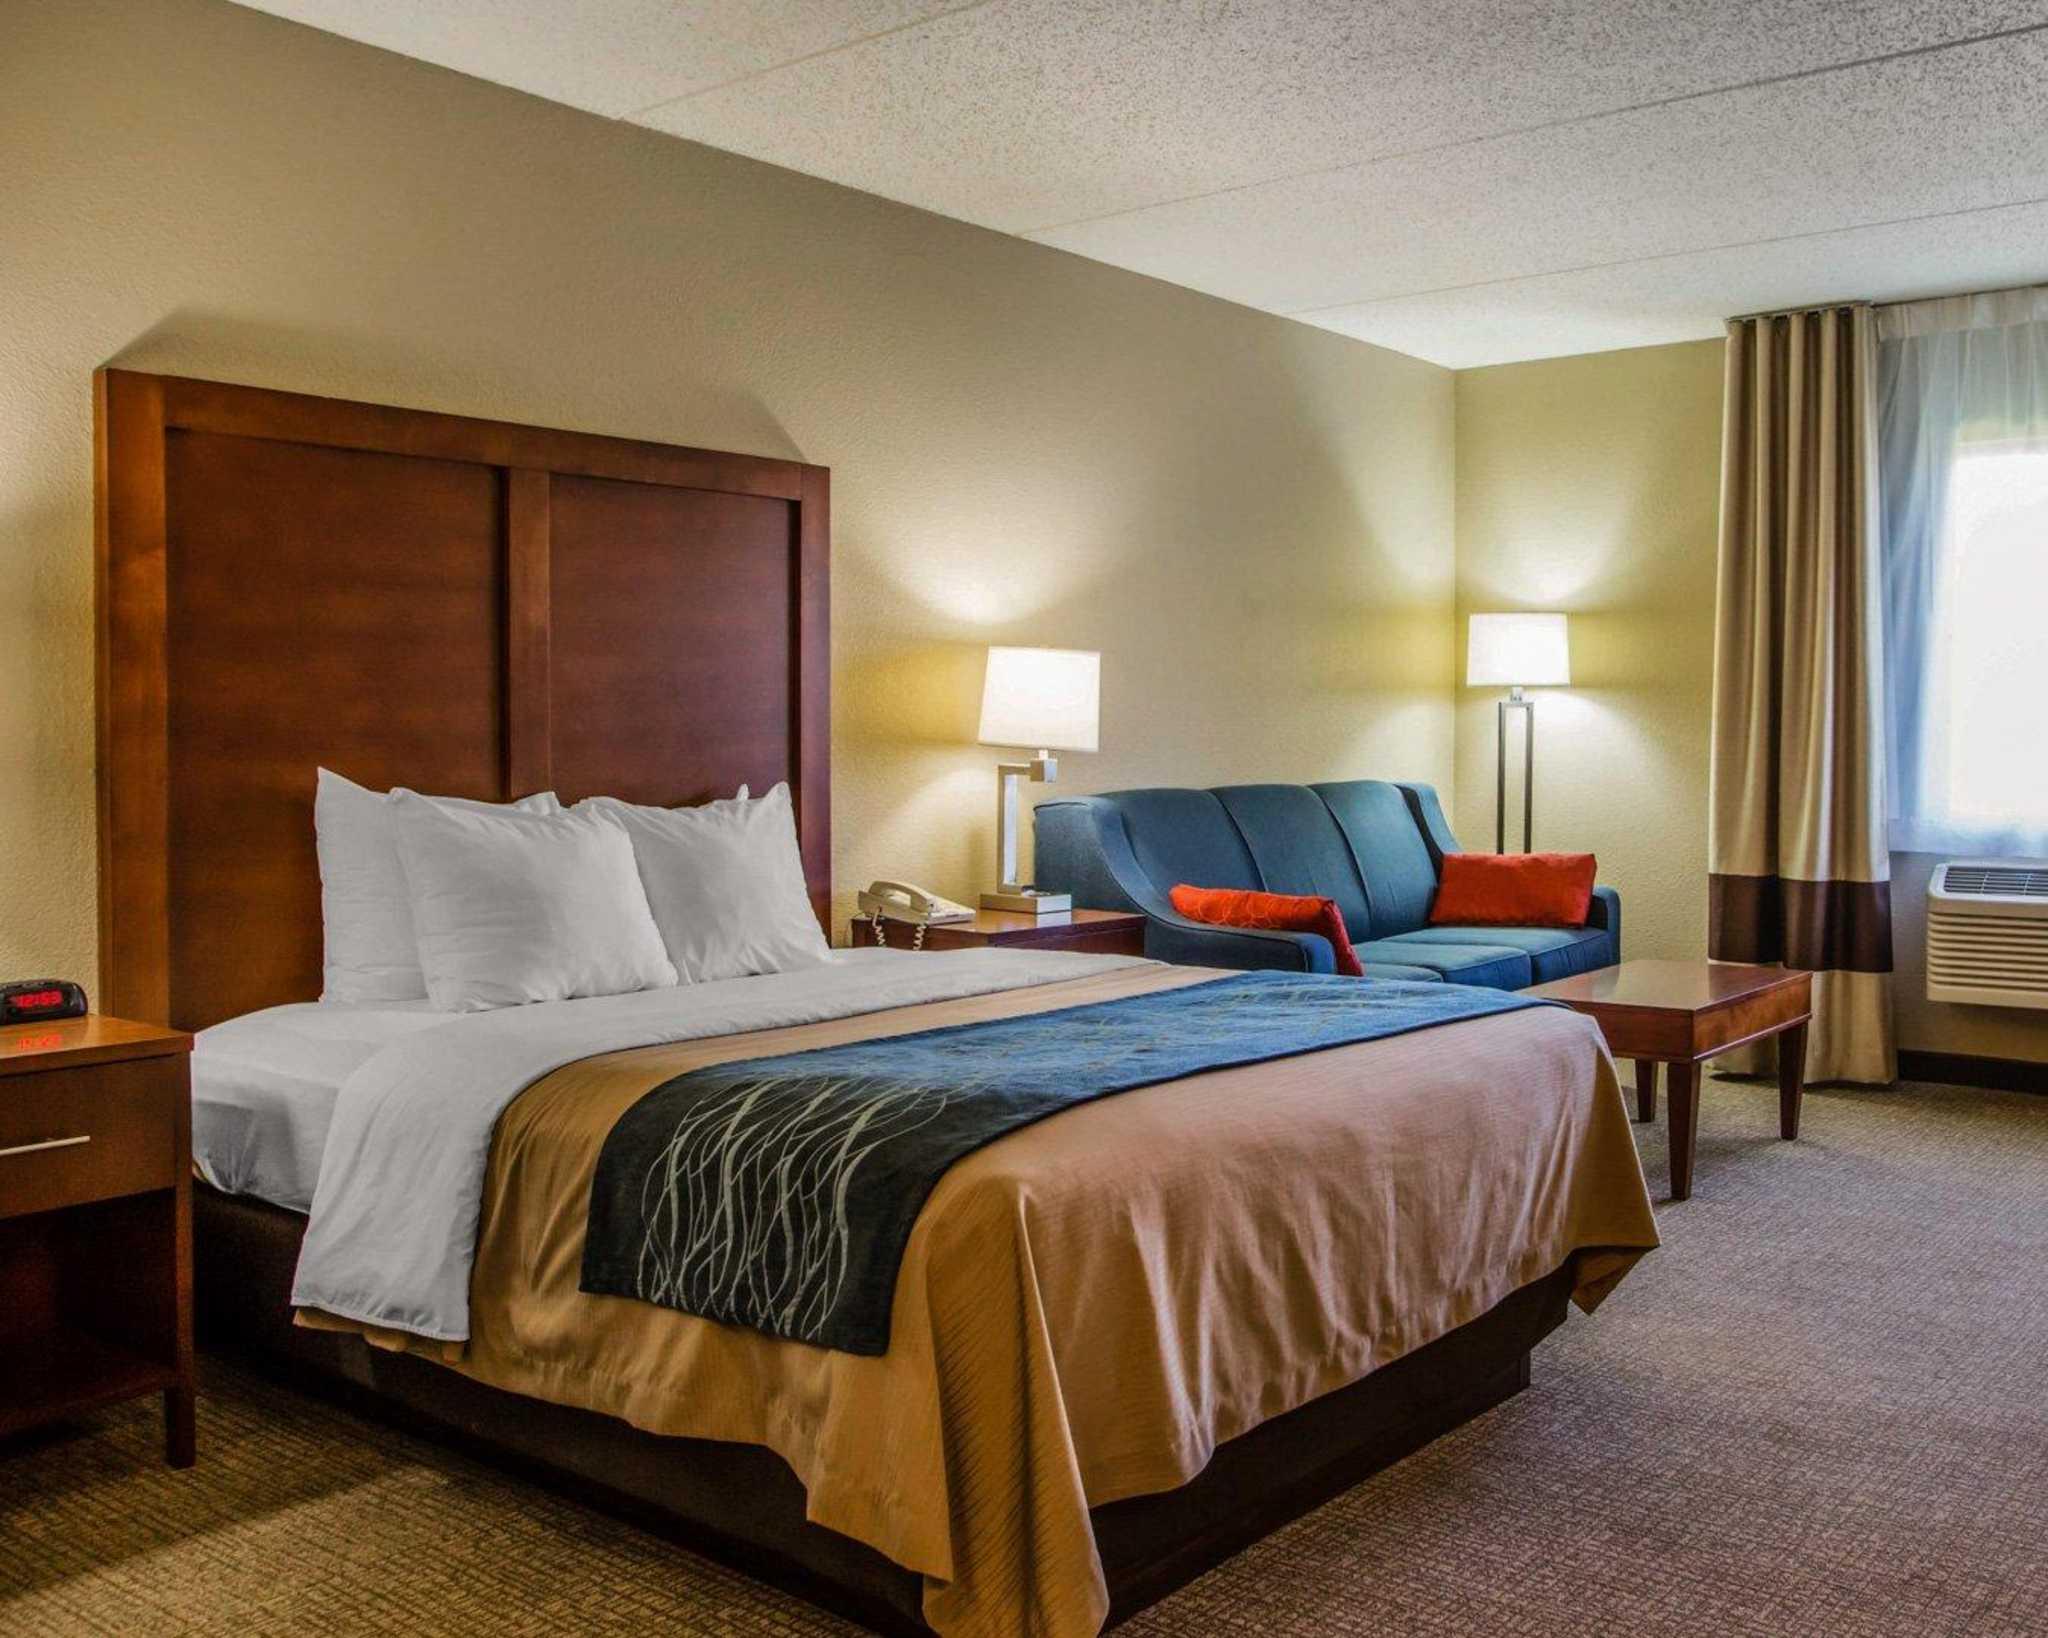 Comfort Inn & Suites Jackson - West Bend image 14